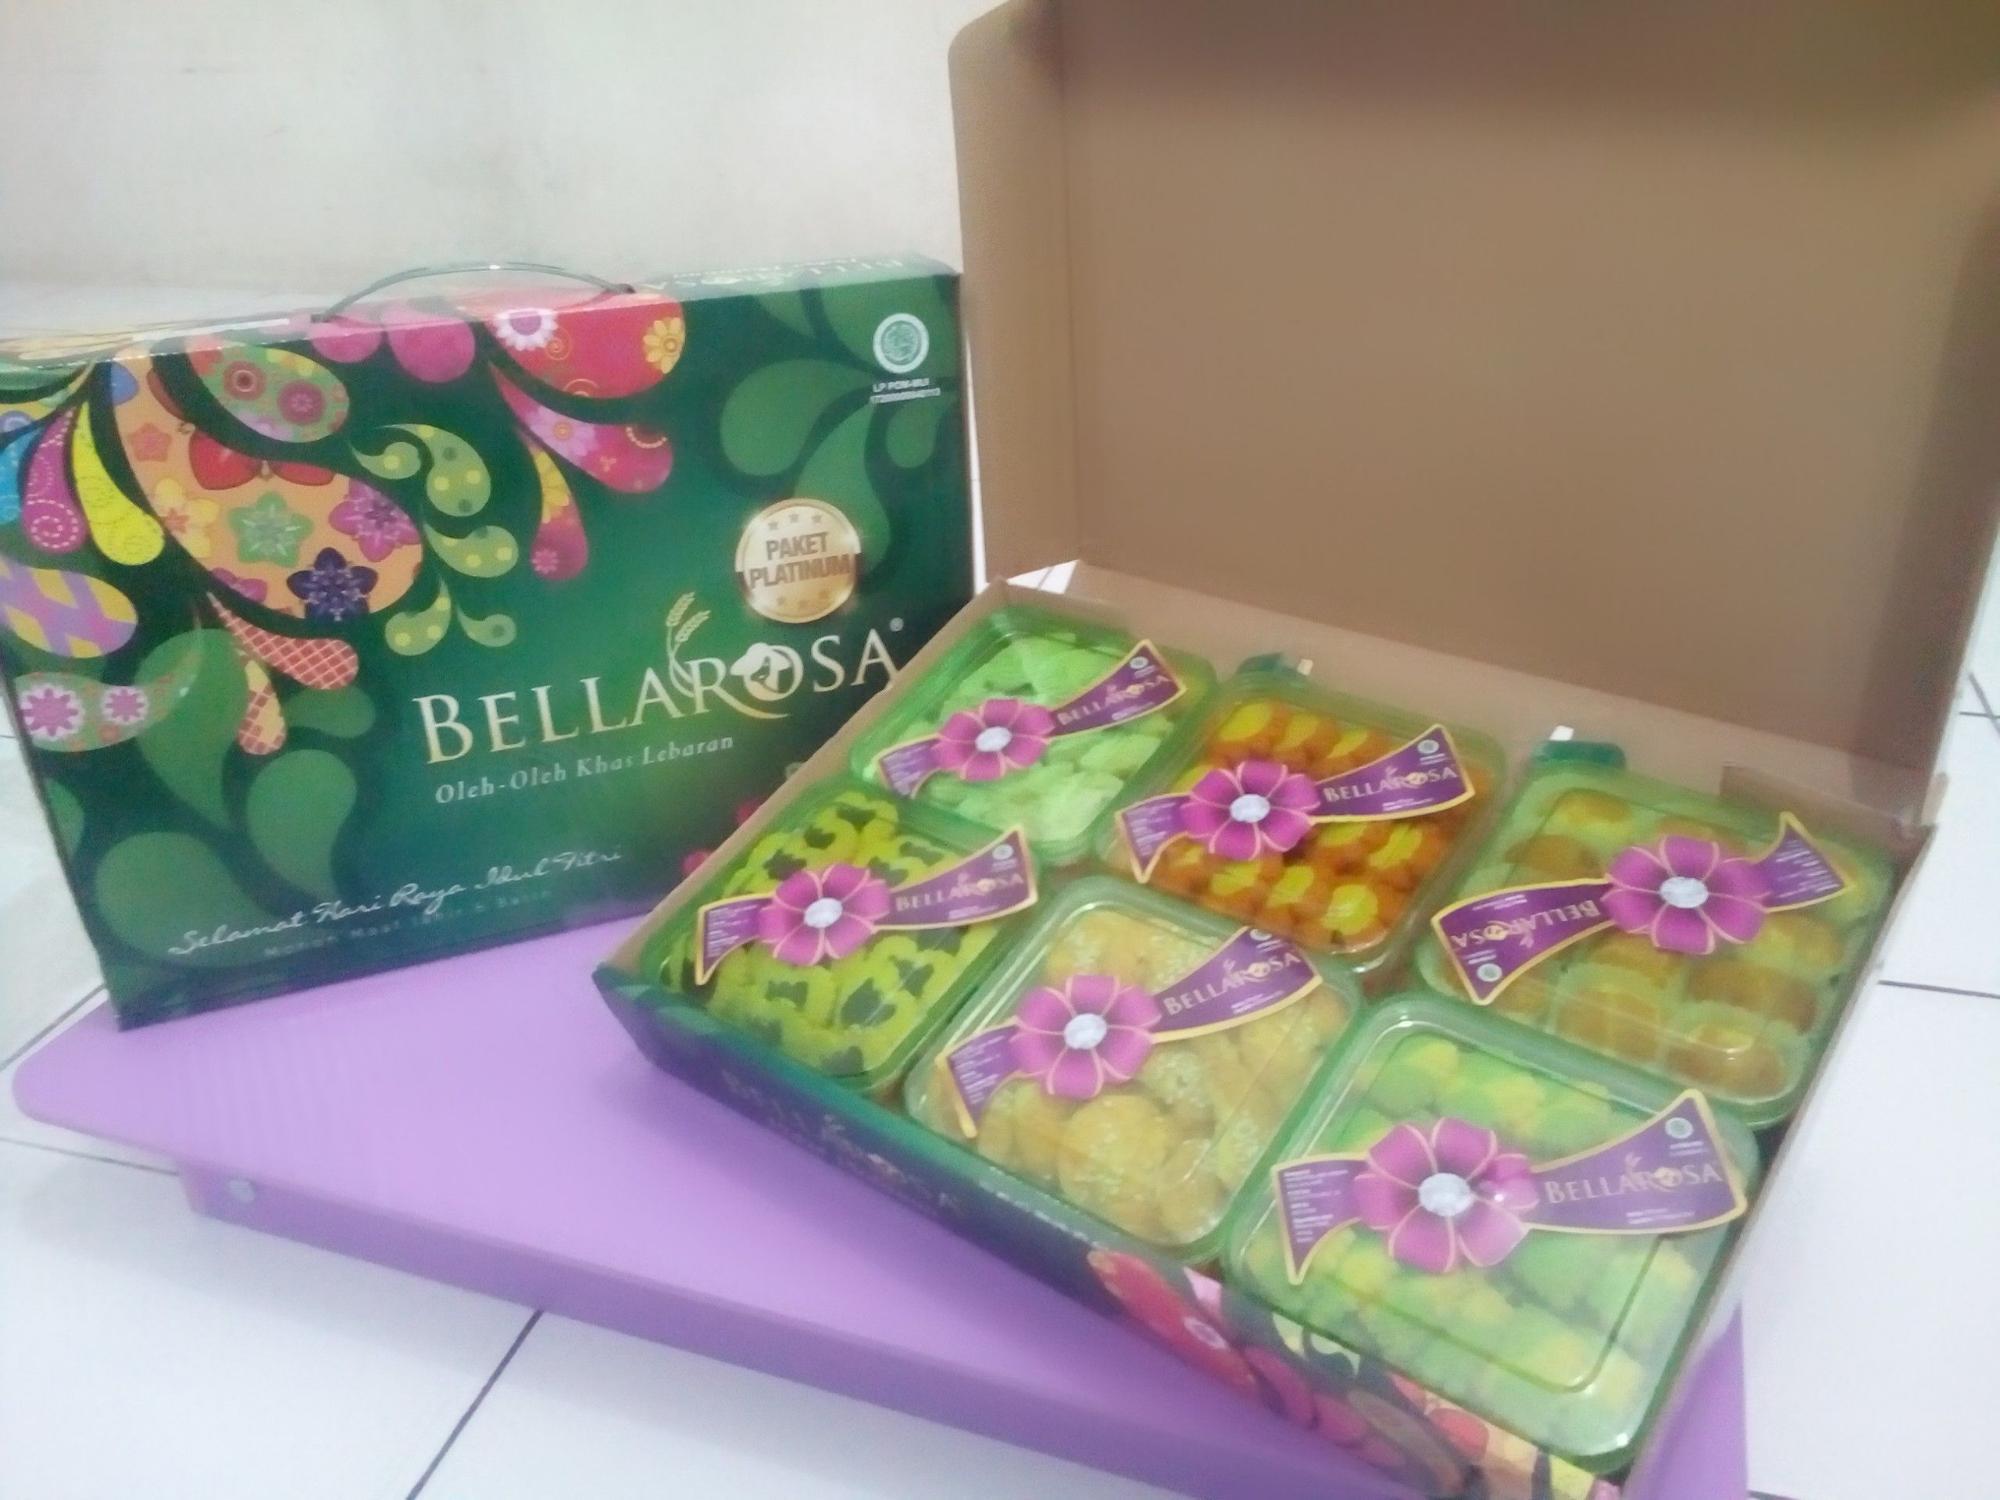 Kue Kering Lebaran Bellarosa Platinum Hitam Daftar Harga Barang 6in1 Paket Berkah Belarosa Cemilan Idul Fitri Hantaran